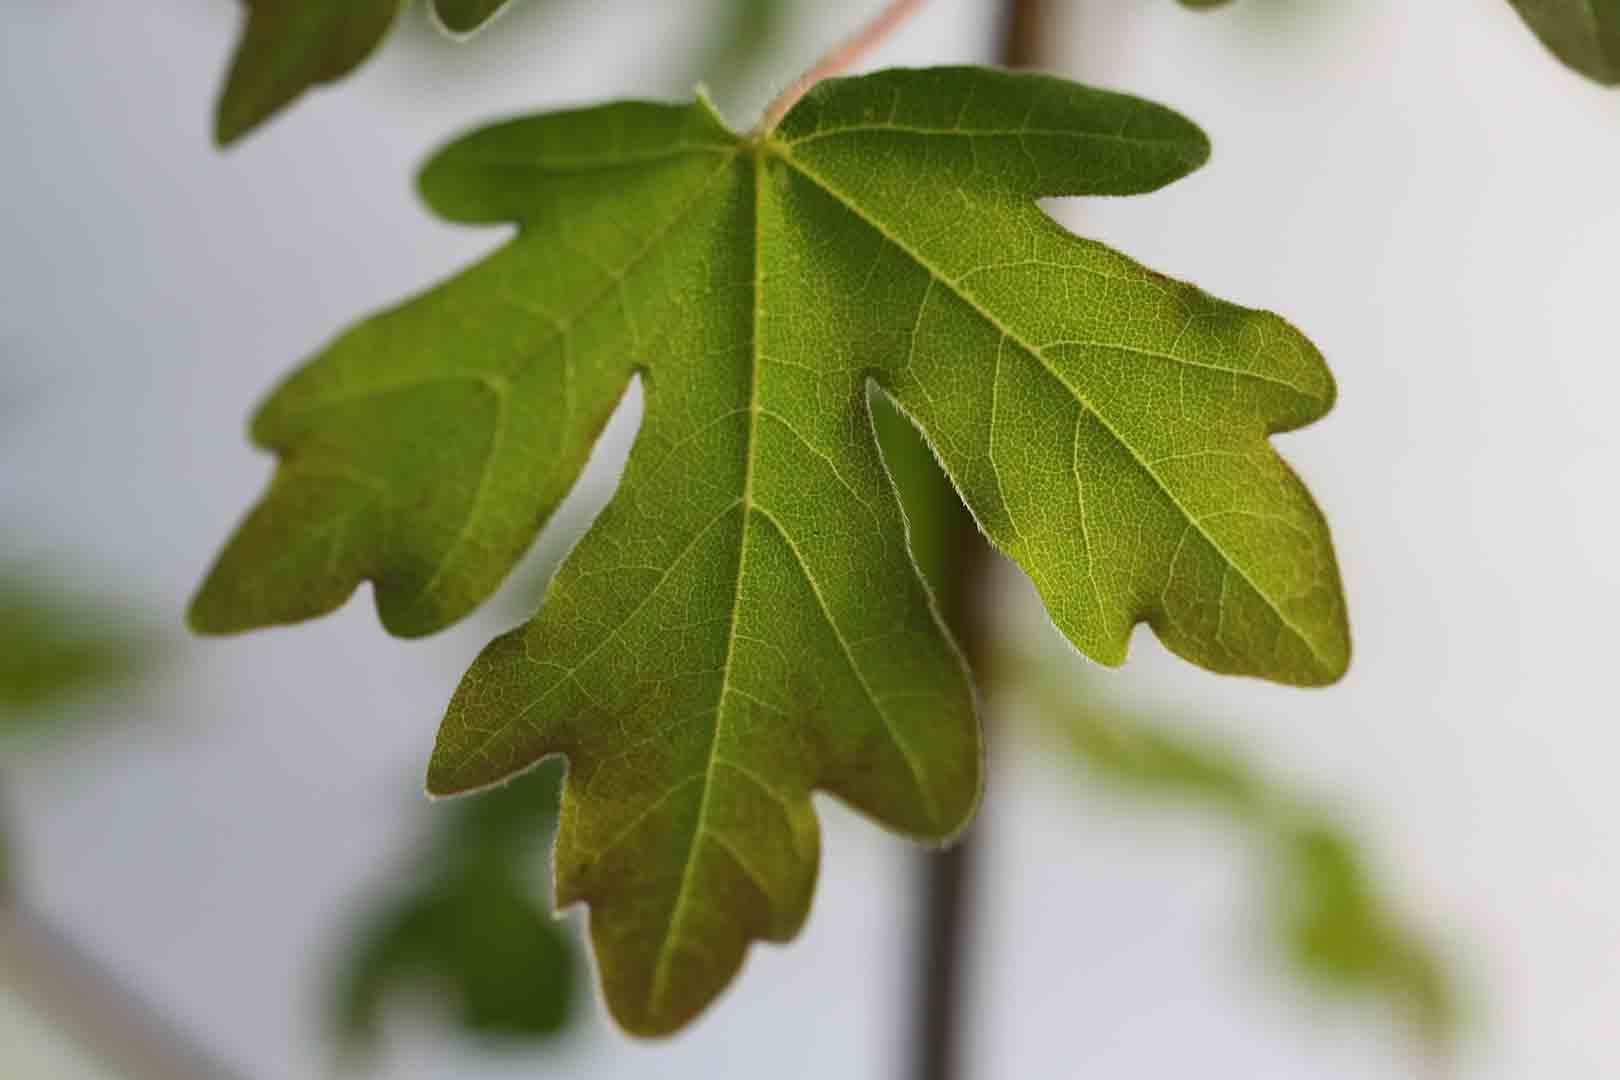 Acer campestre arce com n rbol caducifolio aut ctono en - Arce arbol espana ...